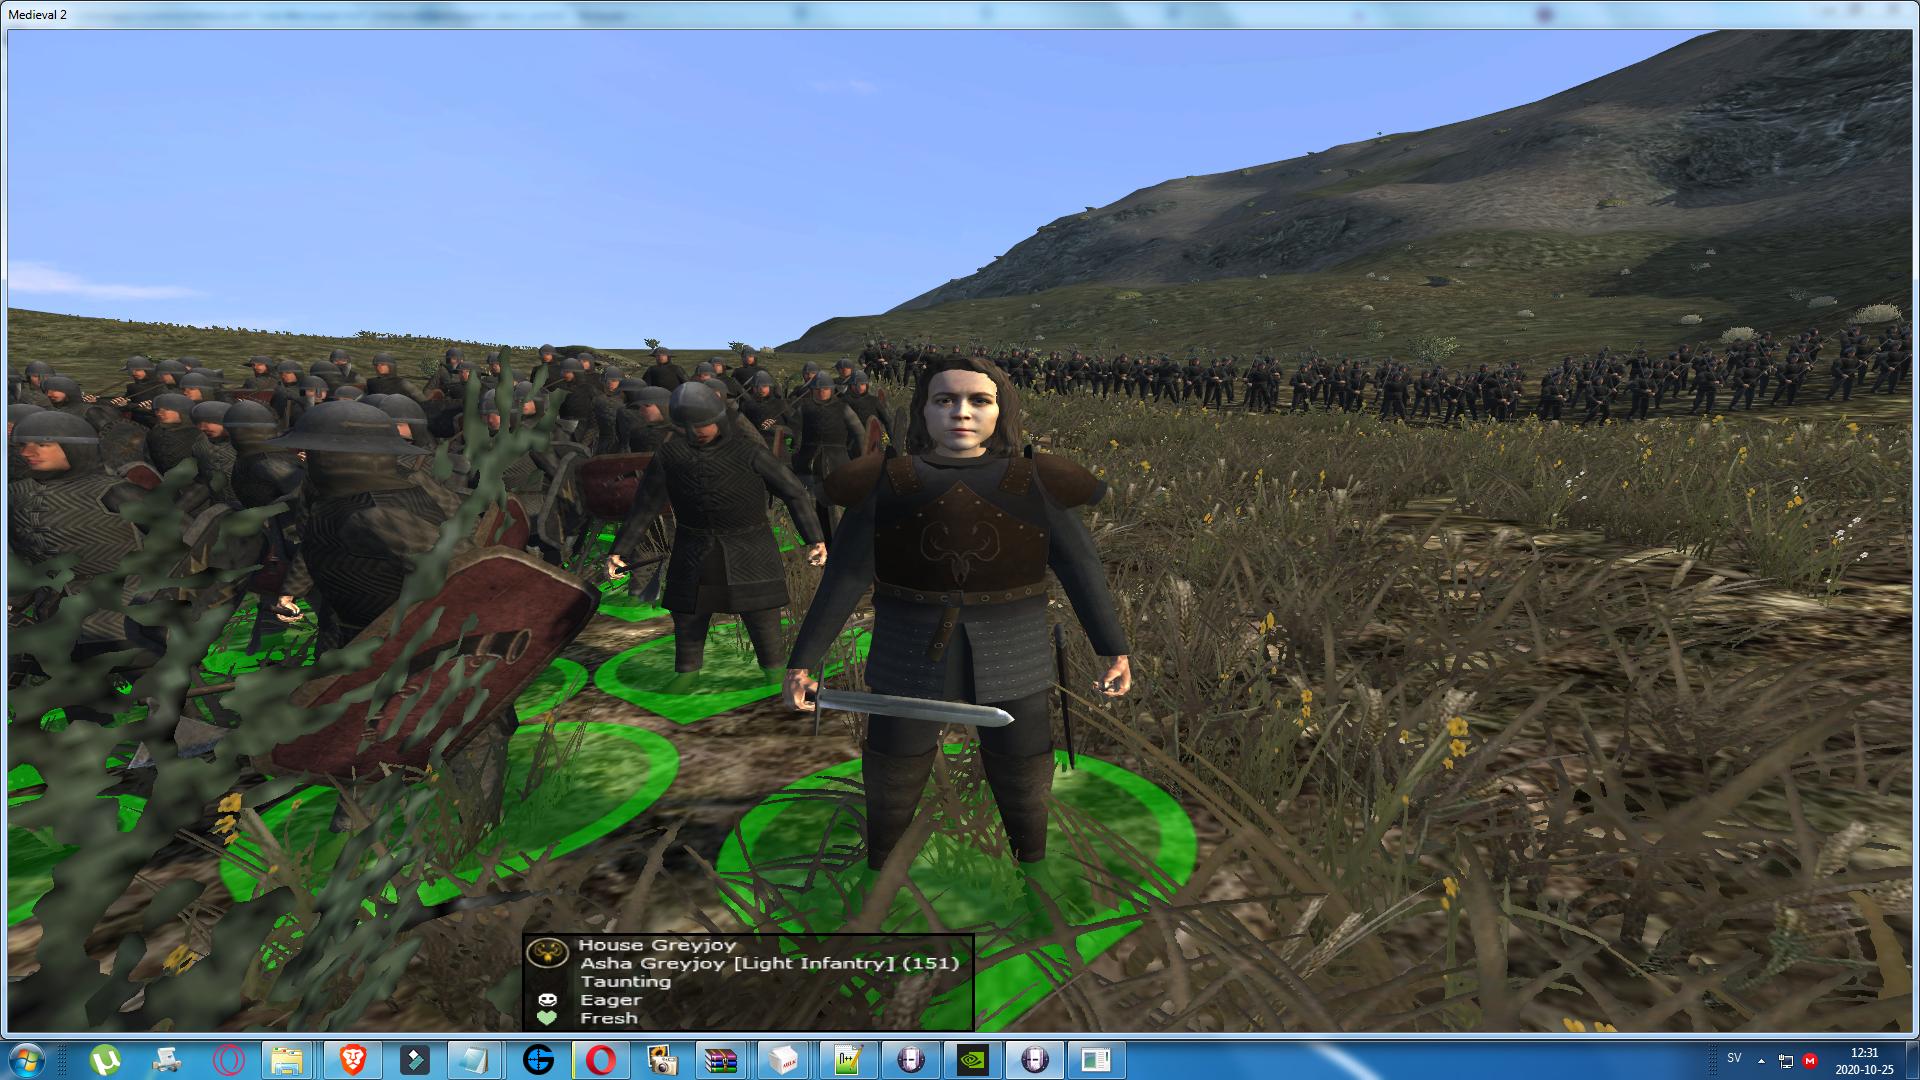 Asha Greyjoy added as a new hero to the mod!